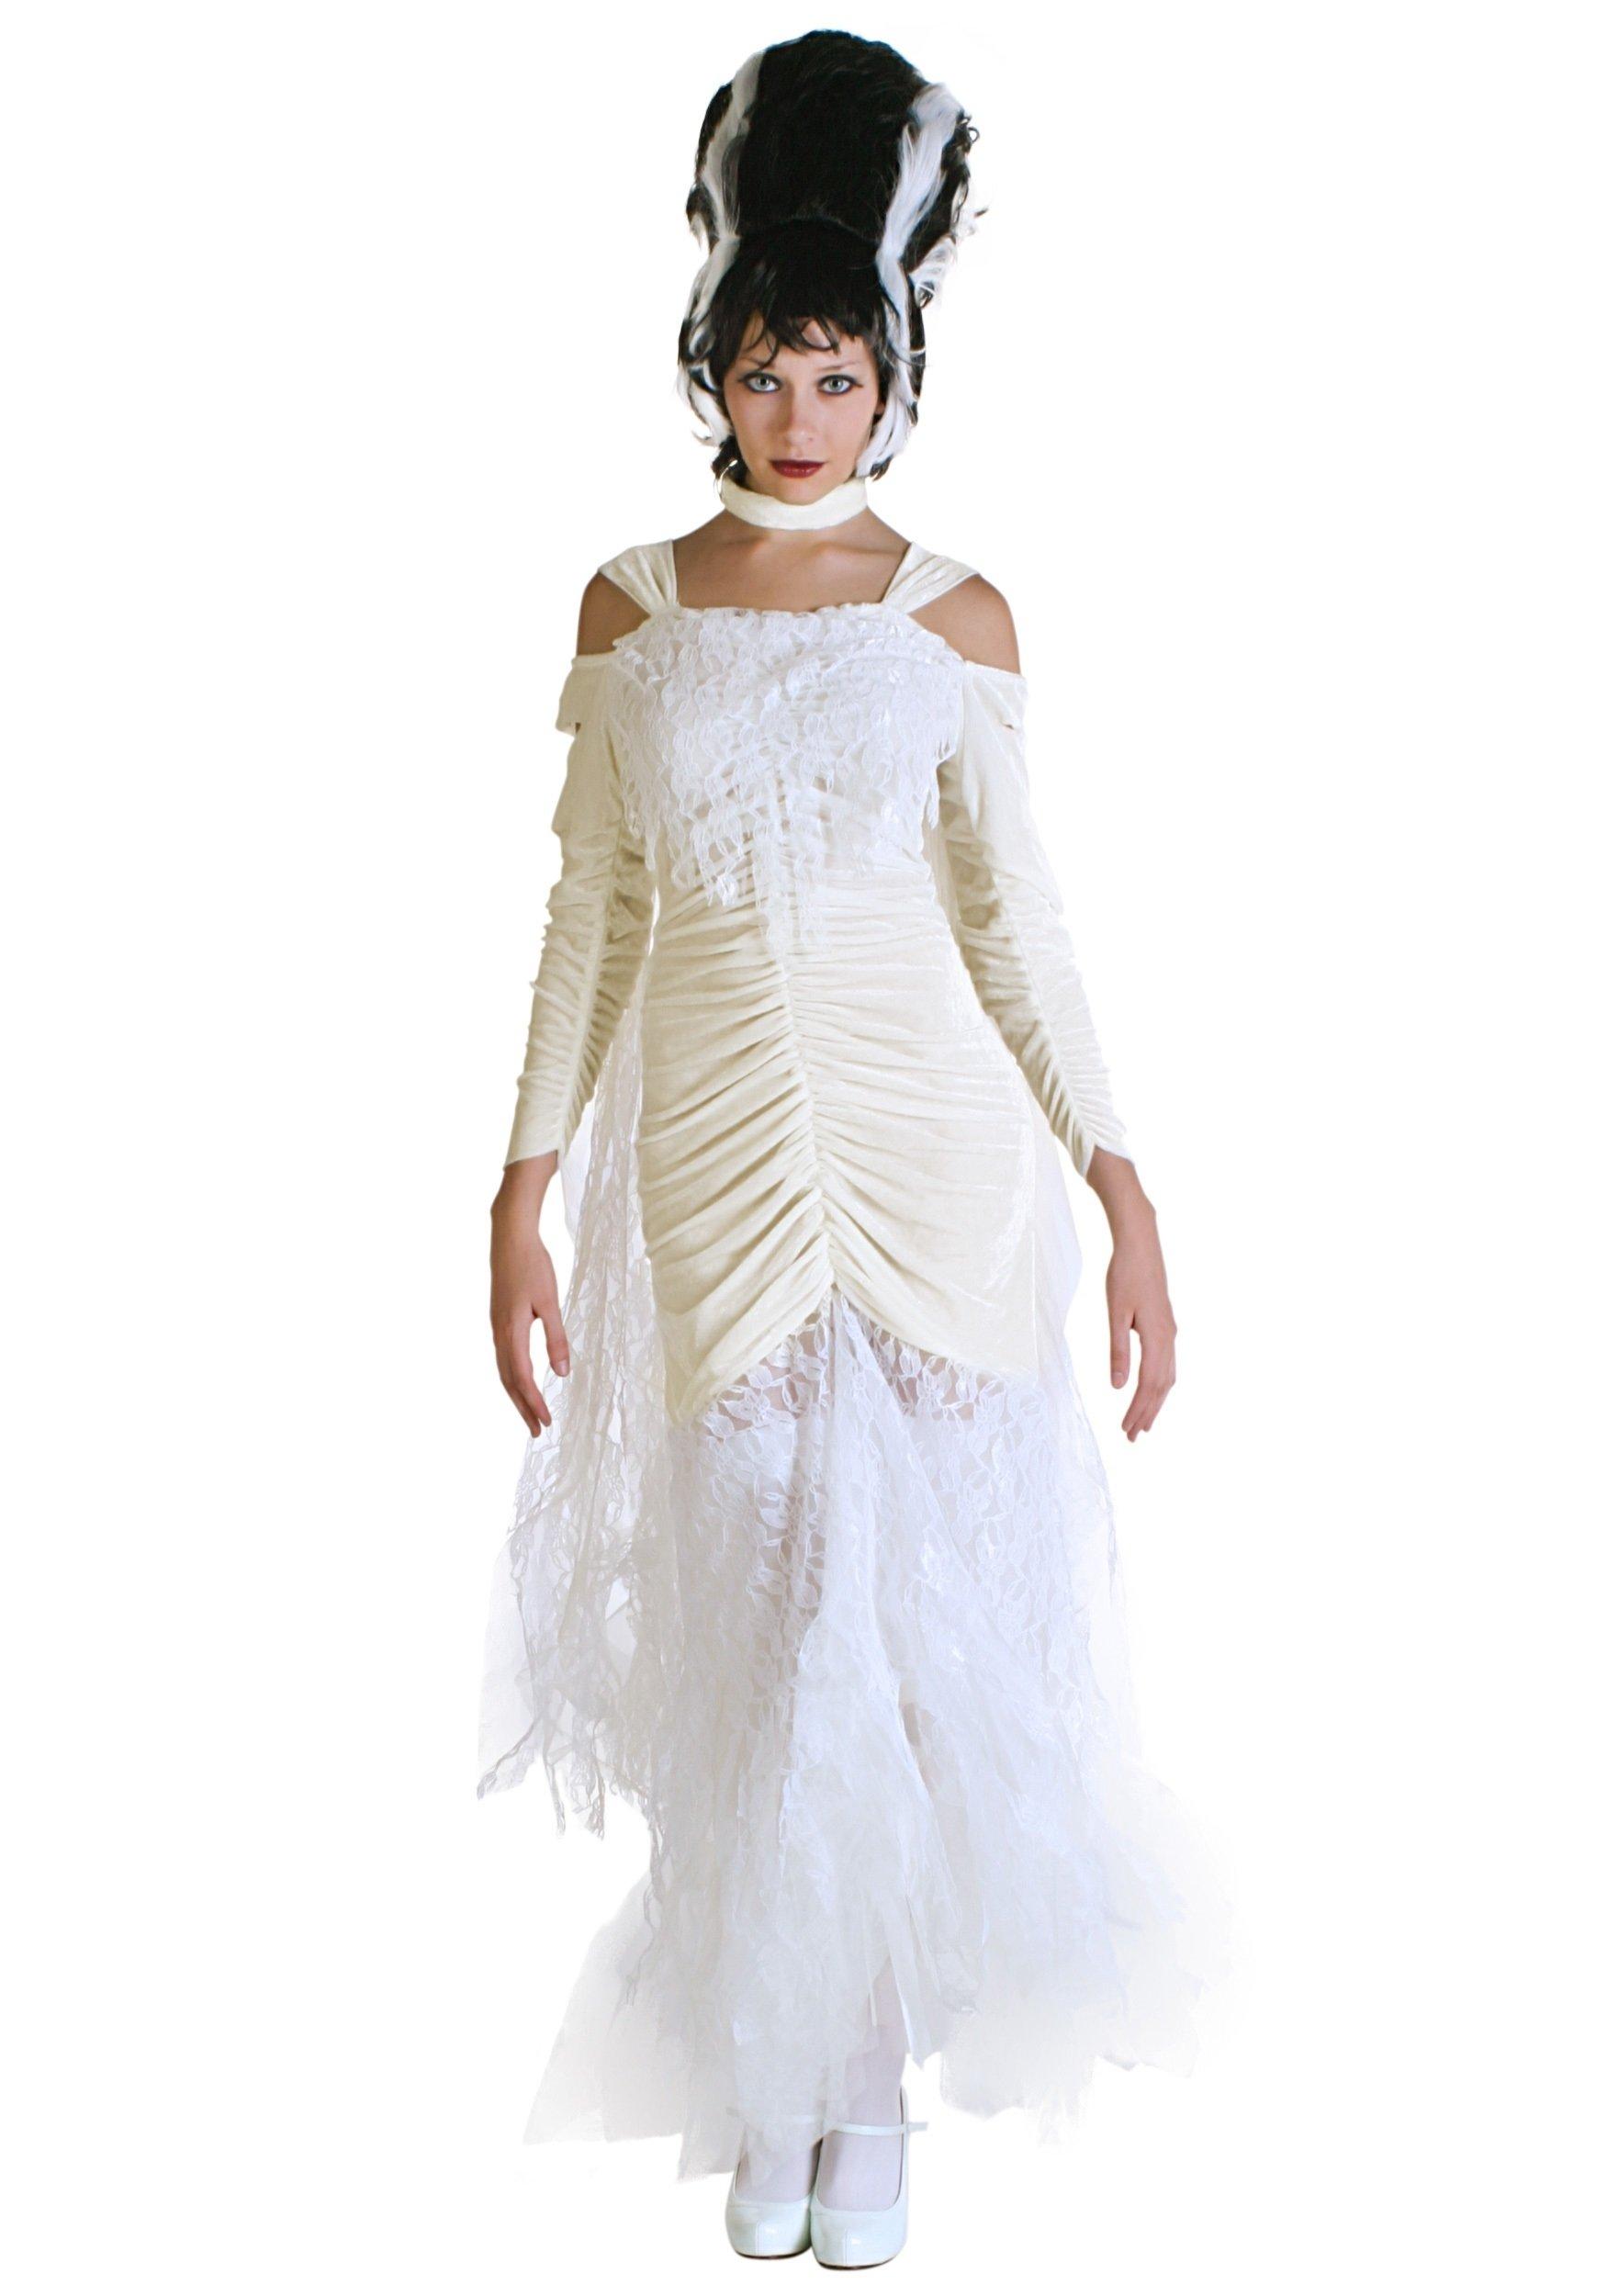 10 Perfect Bride Of Frankenstein Costume Ideas bride of frankenstein costume 2021